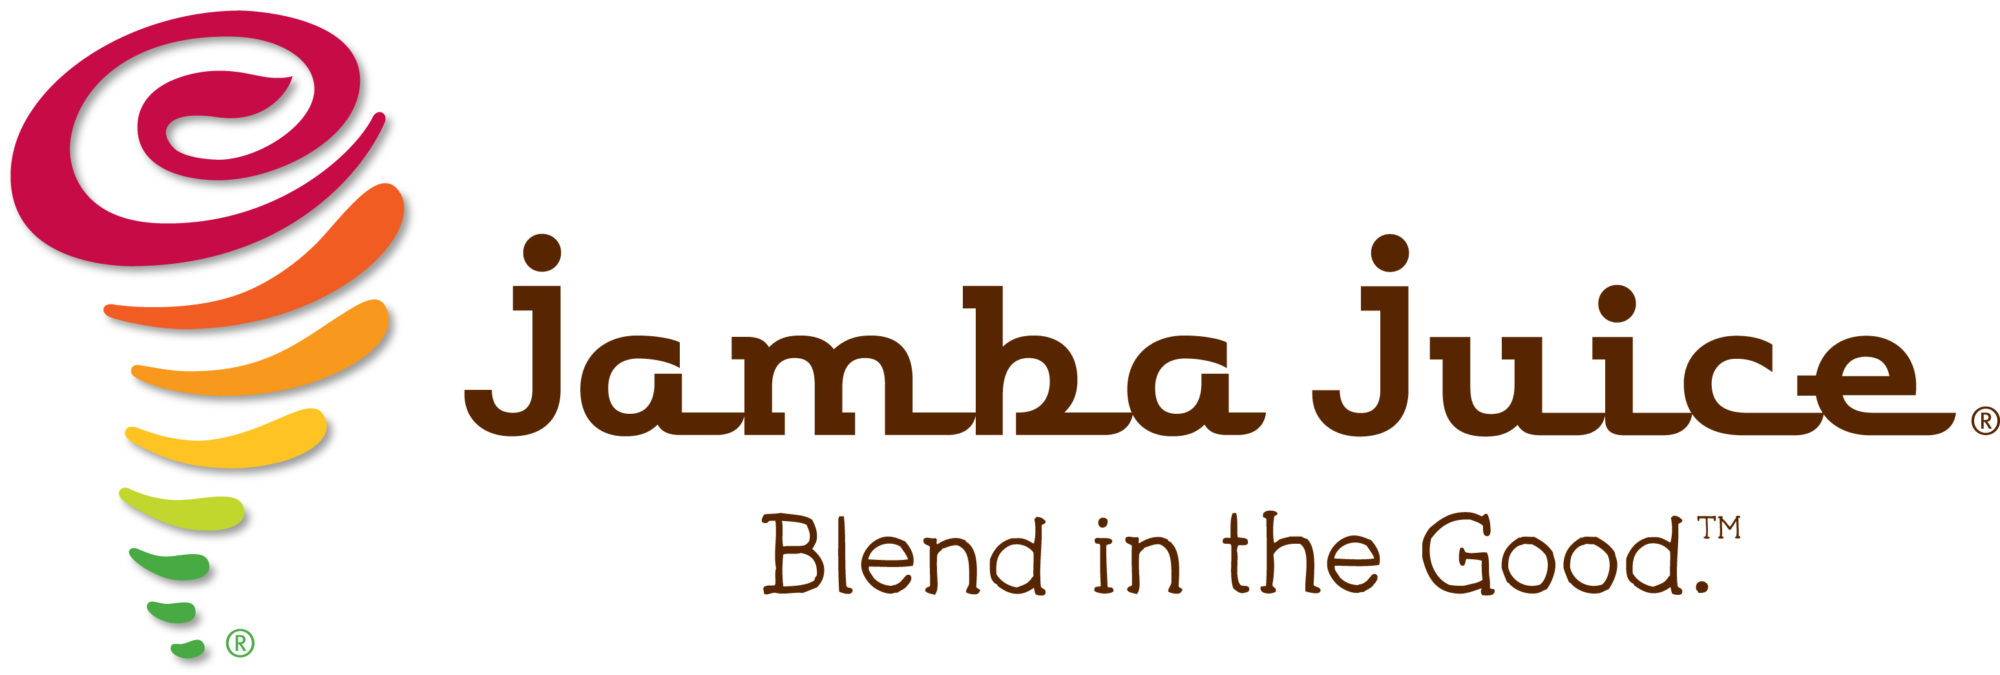 Jamba Juice 25th Anniversary Influencer Campaign